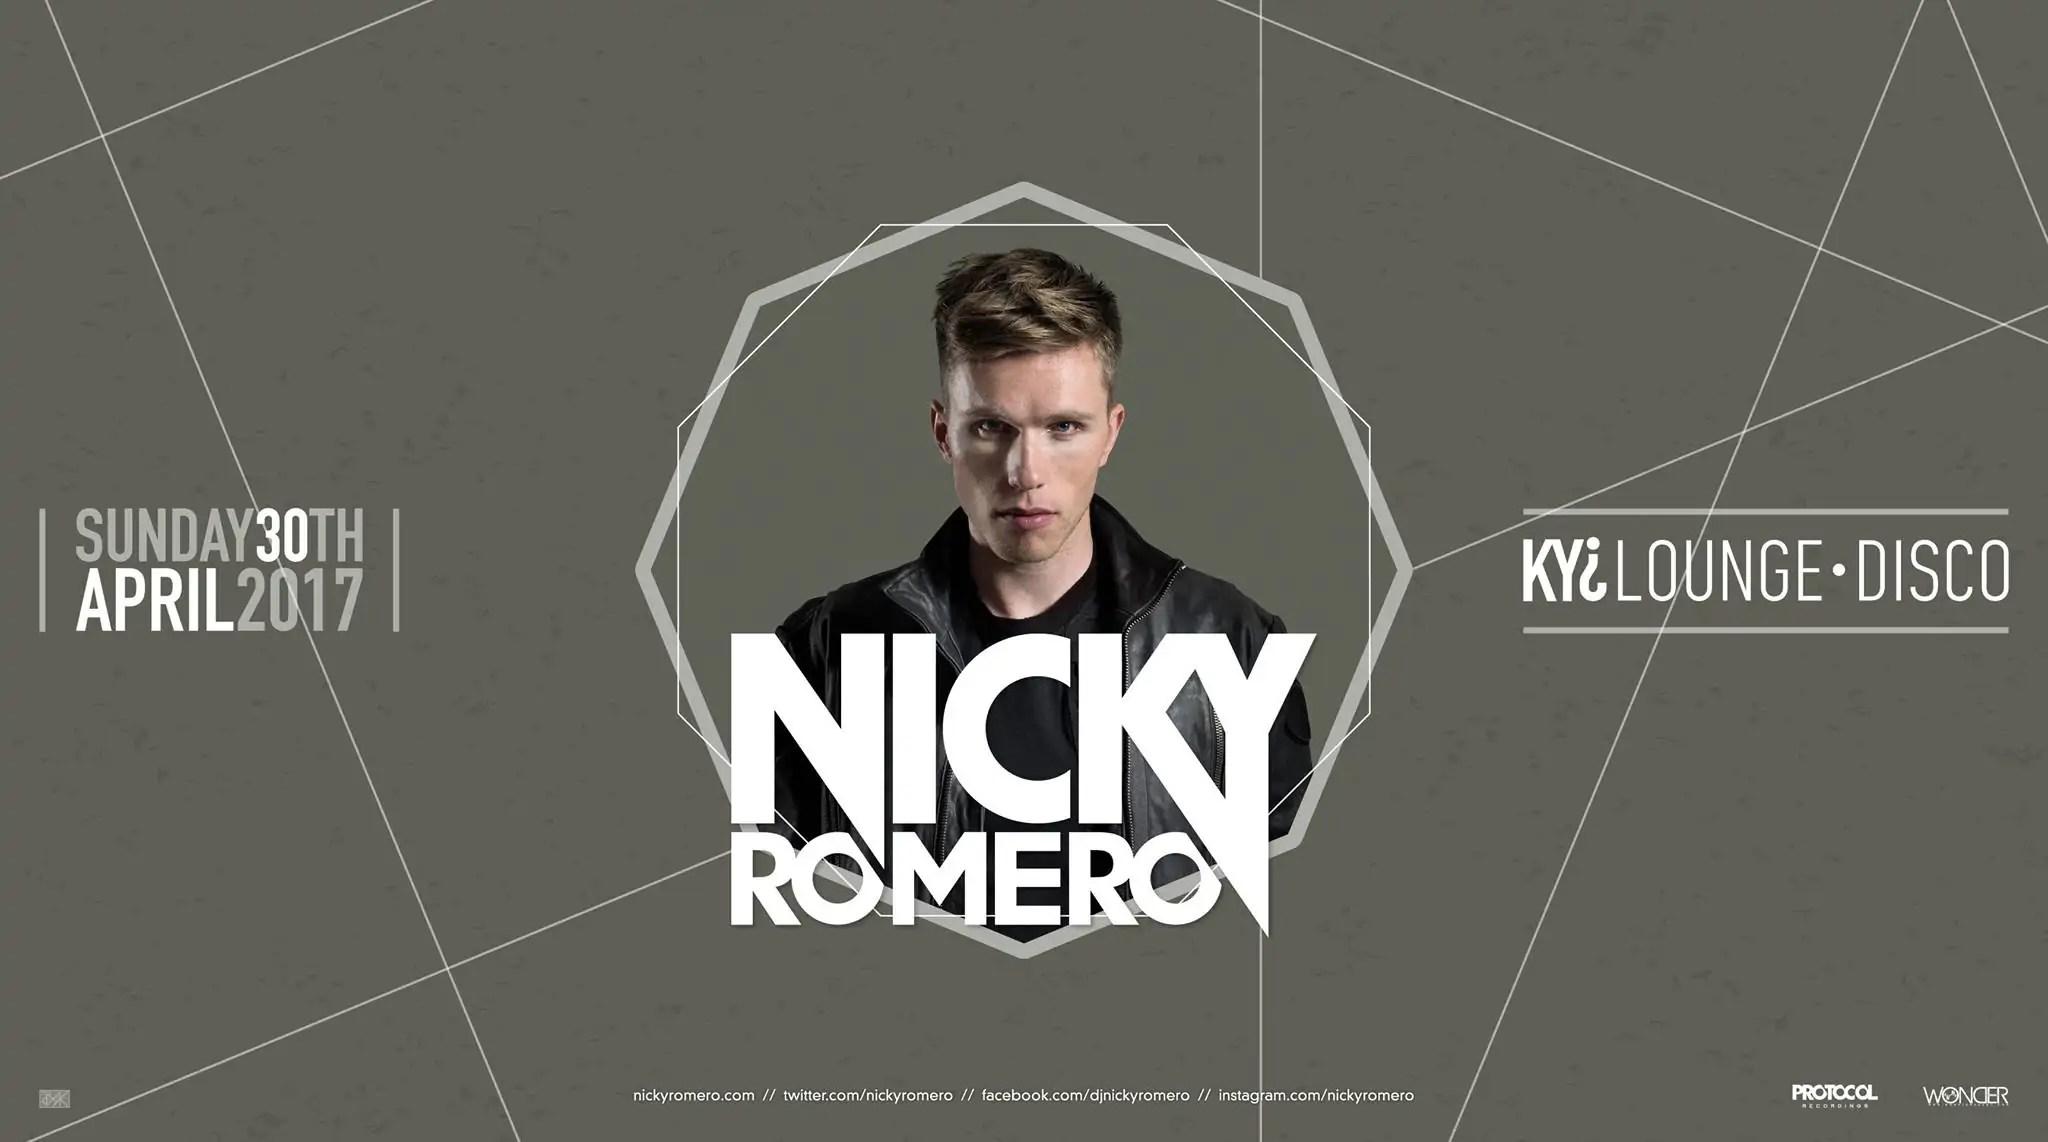 Kiy Louge Disco Nicky Romero 30 Aprile 2017 Ticket Pacchetti